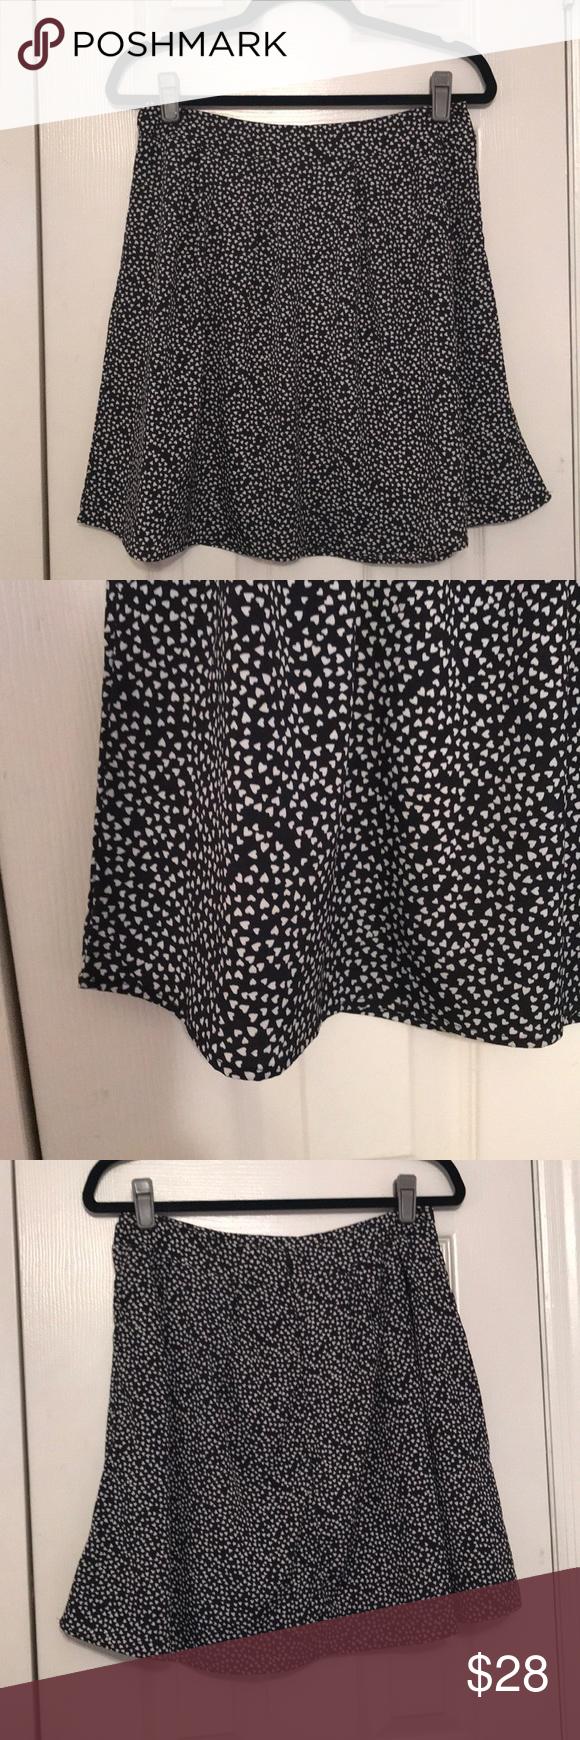 Zip Up Black and White Heart Skirt Black skirt with white